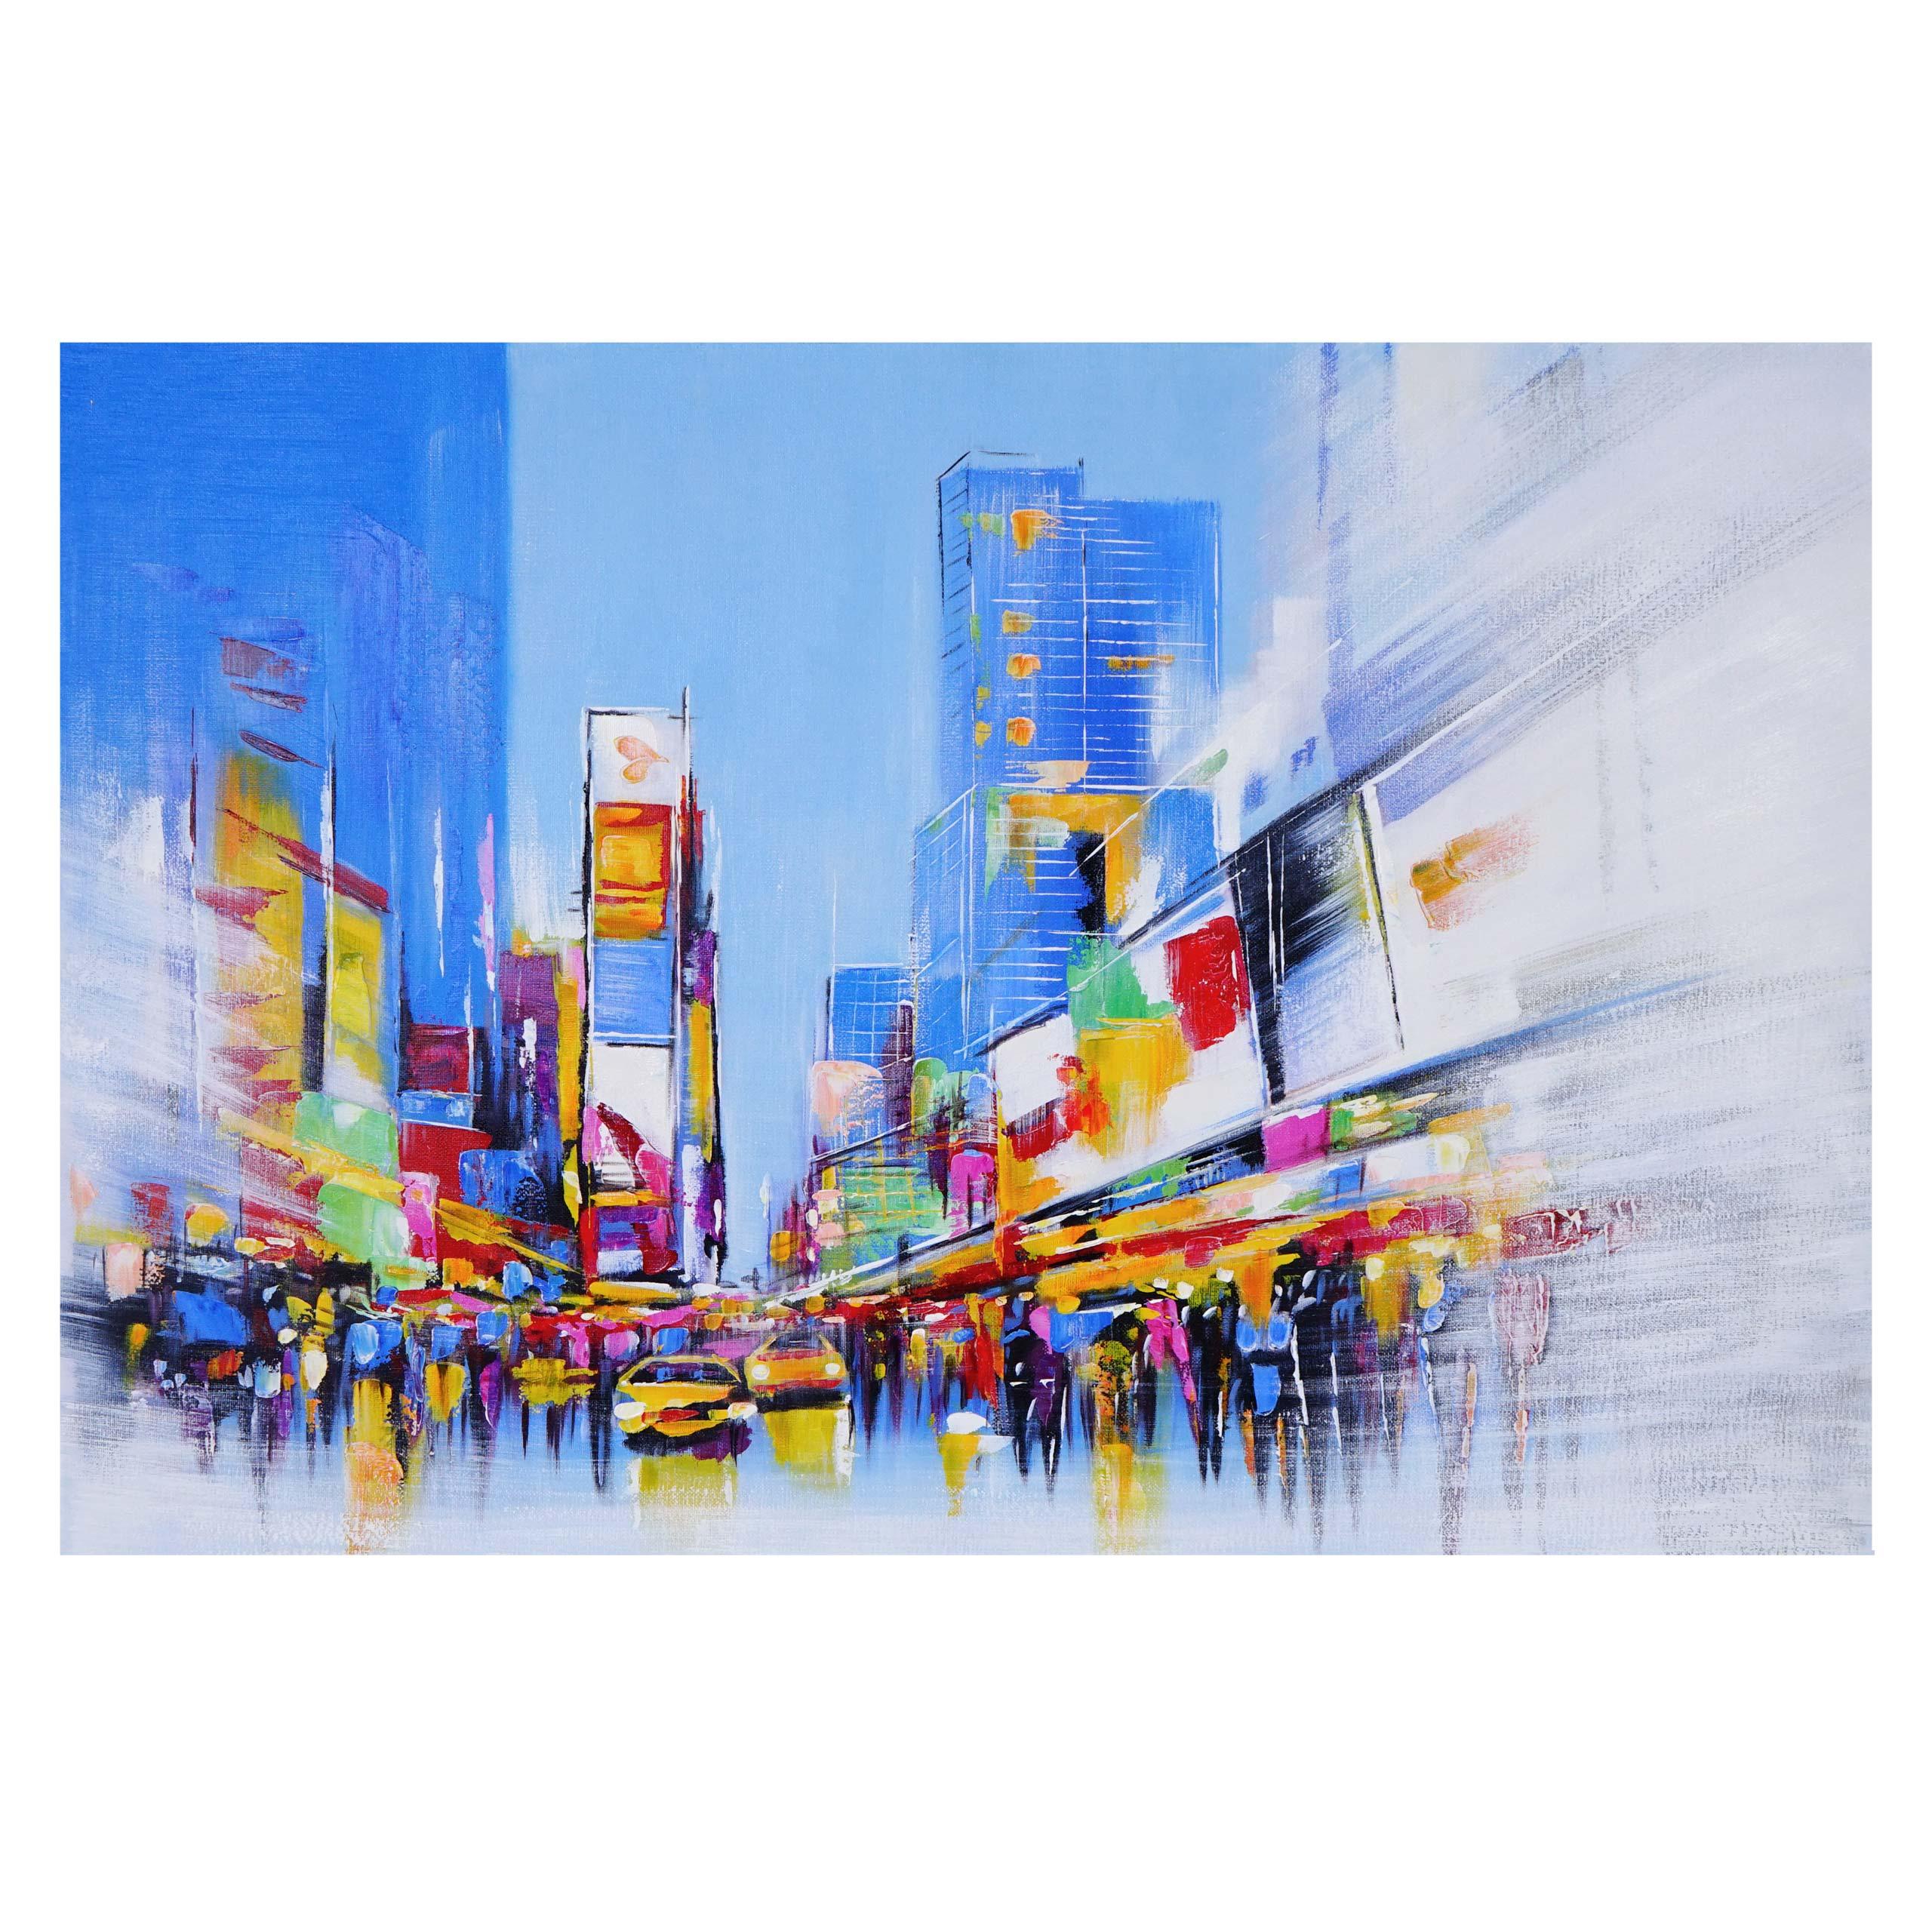 Mendler Ölgemälde Times Square, 100% handgemaltes Wandbild Gemälde XL, 120x80cm ~ Variantenangebot 59447